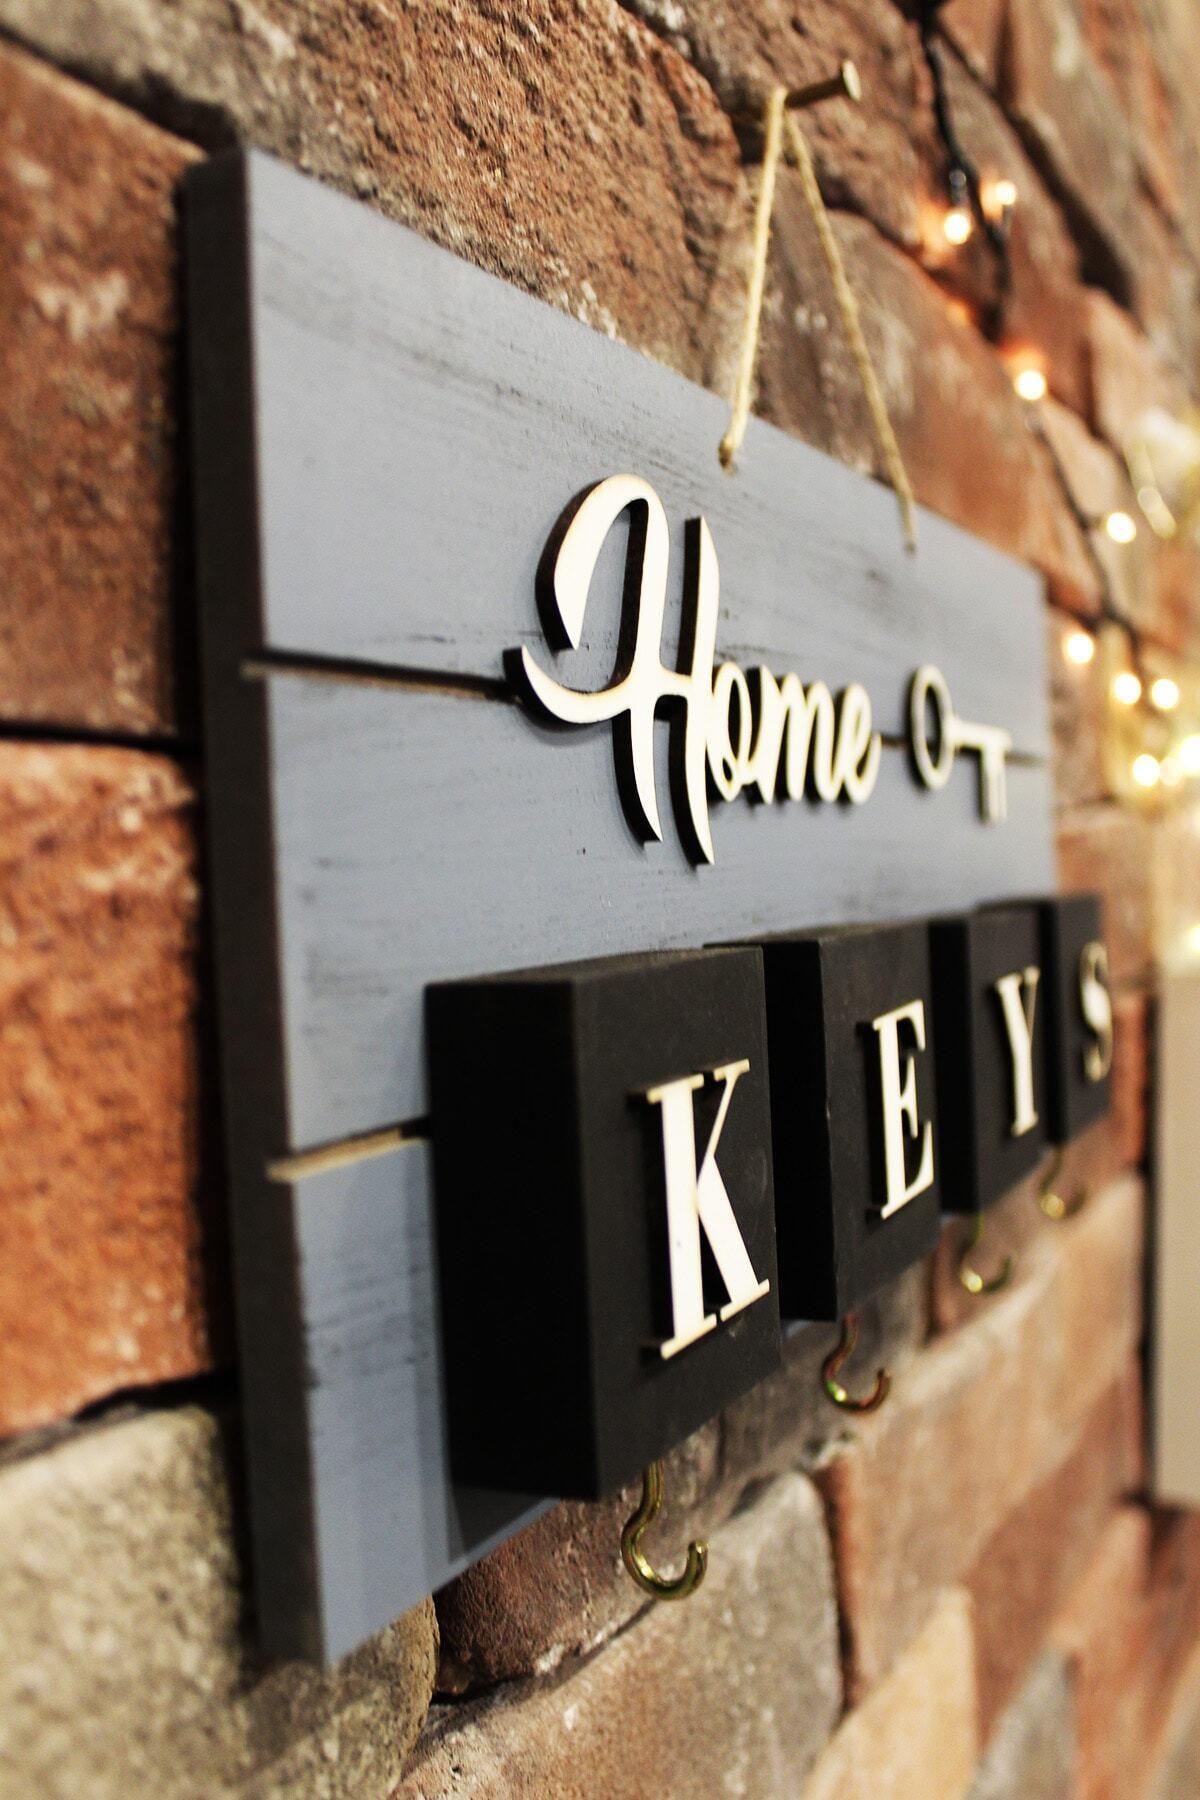 The Company Home El Yapımı Ahşap Anahtarlık, Askısı Pano Anahtarlık Gri Renk 1